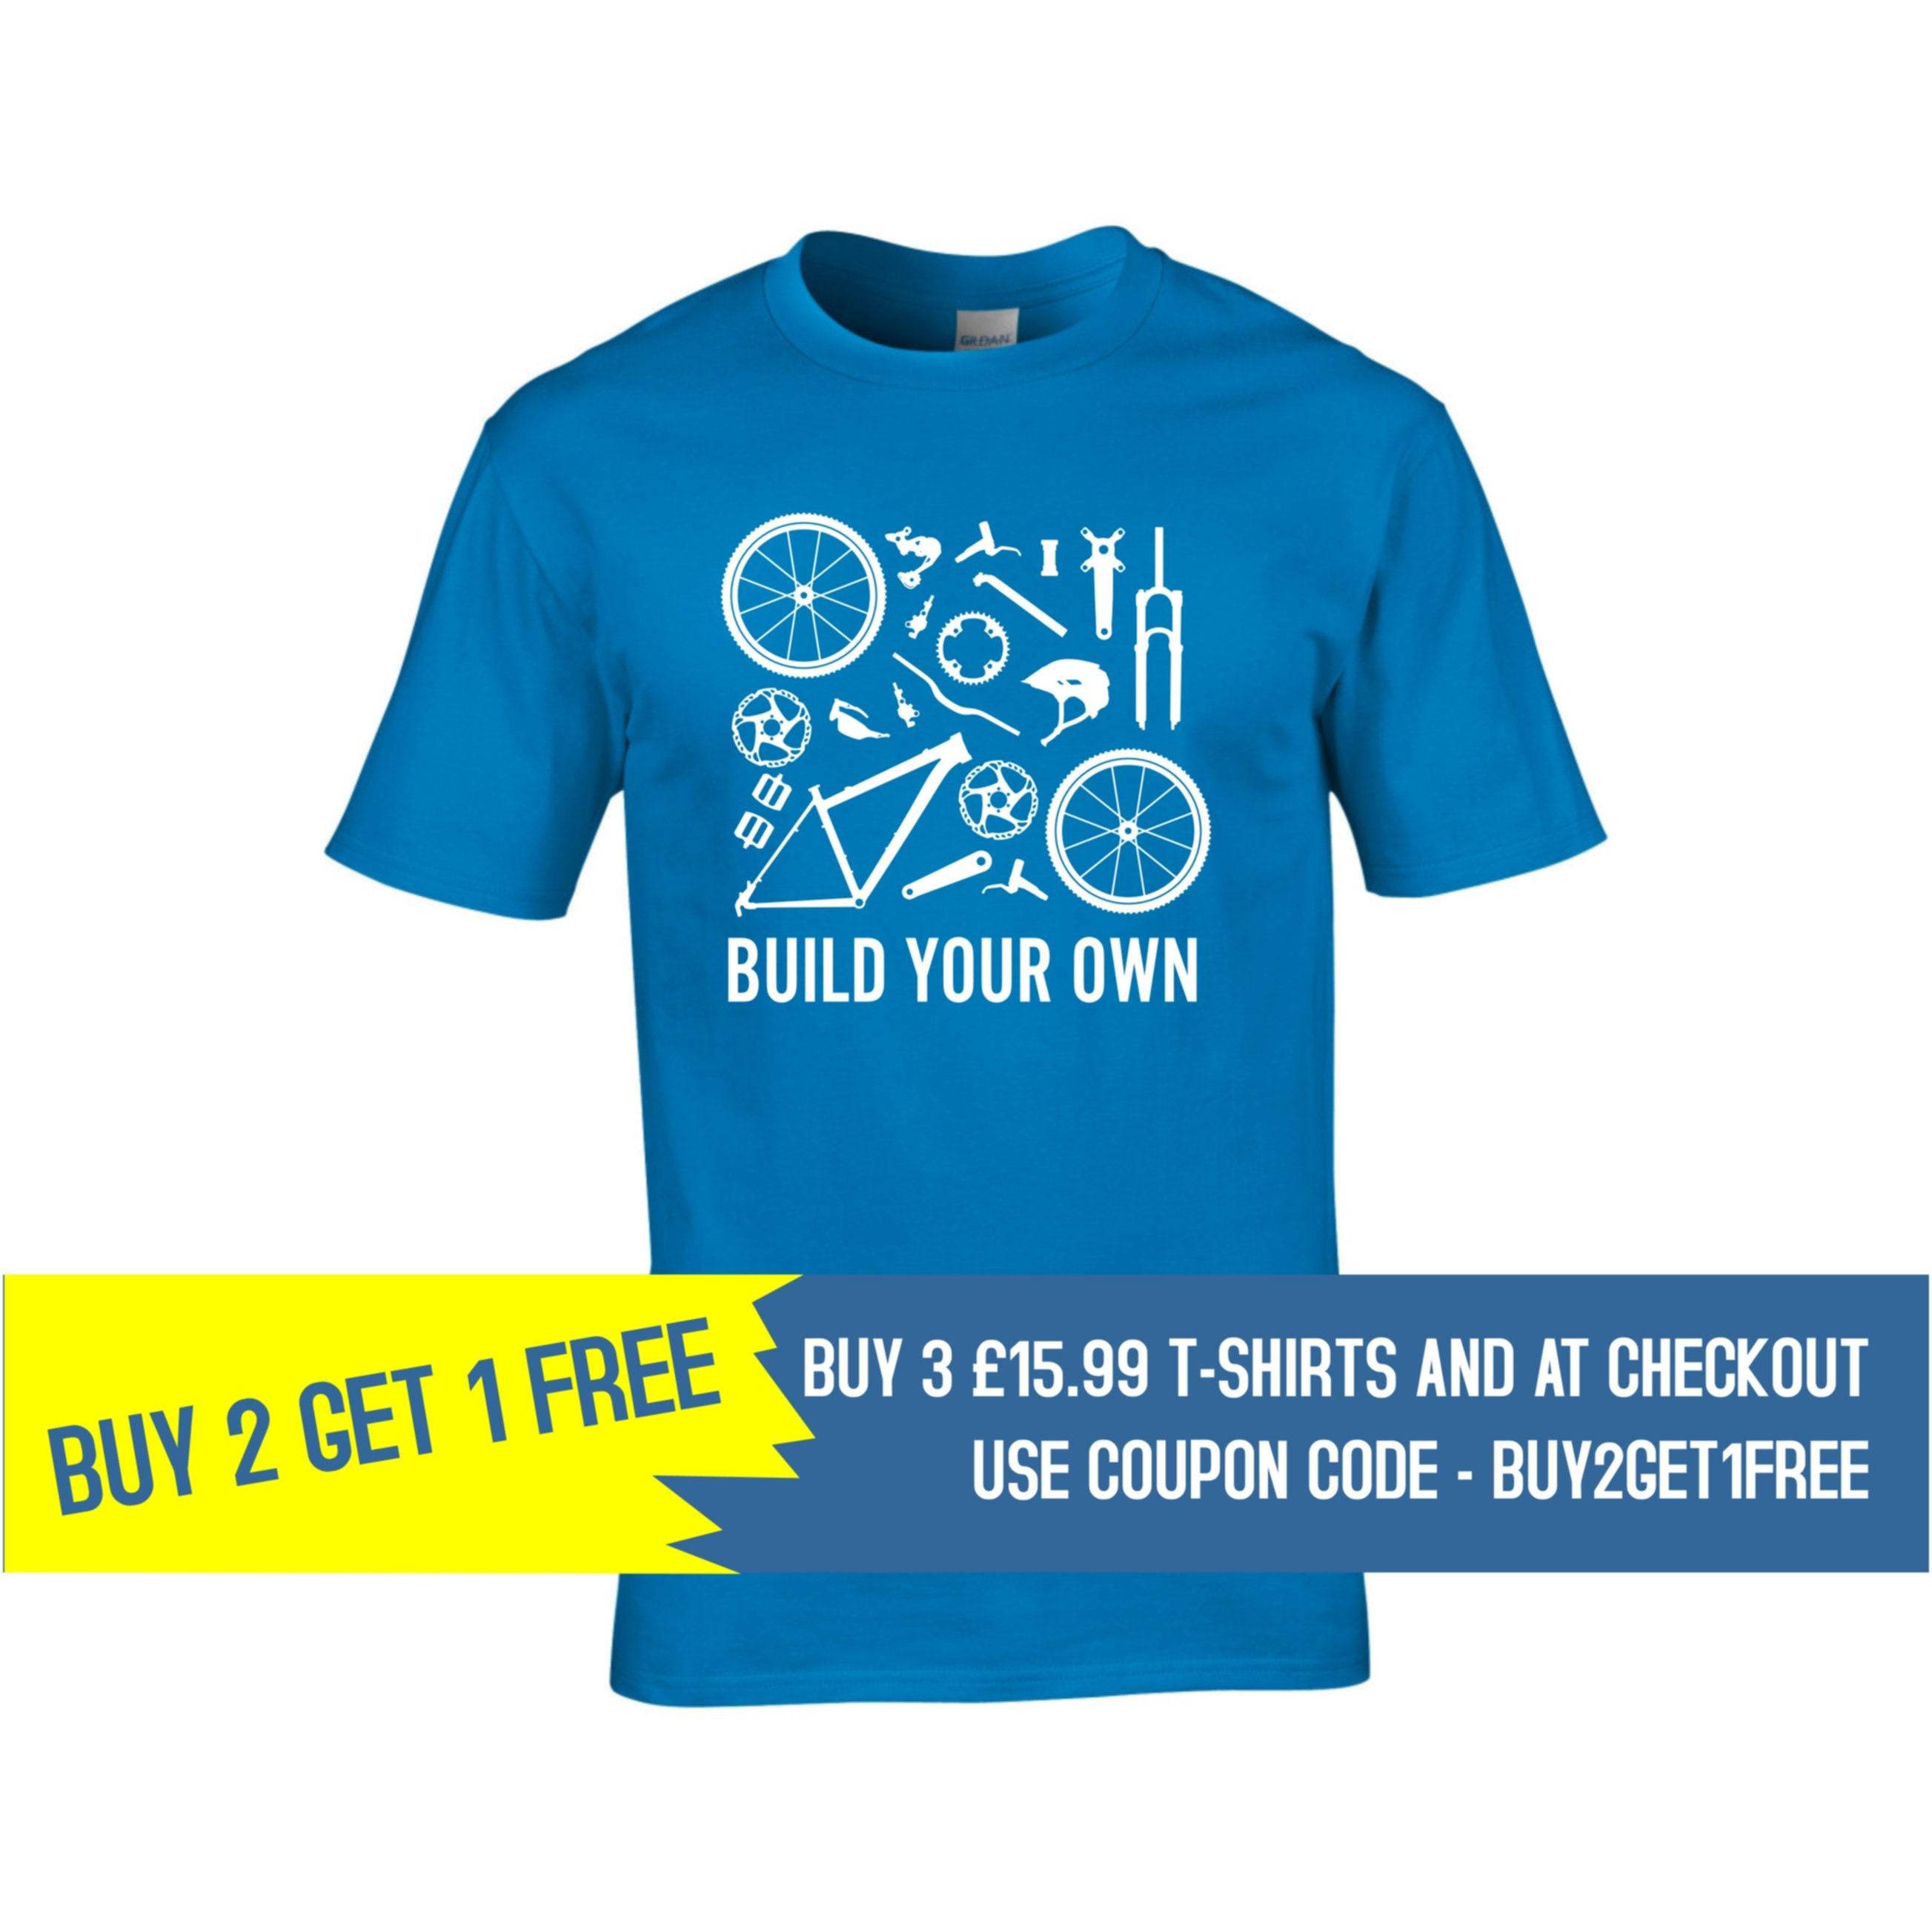 8f3a4583 Men's cycling t shirt, Cycling gifts, Bicycle parts t shirt, Buy 2 Get 1  Free ...